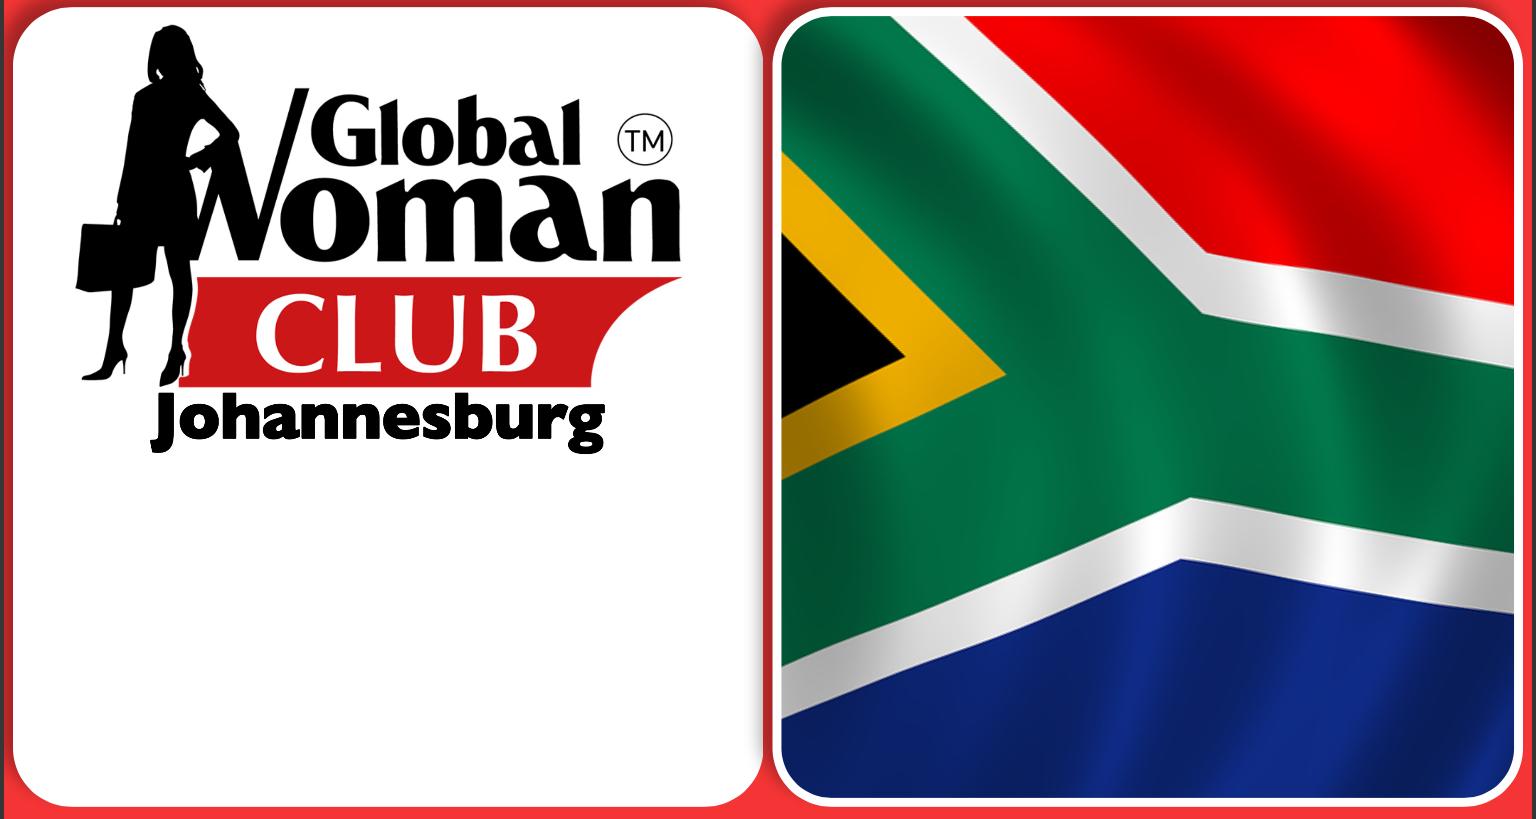 GLOBAL WOMAN CLUB JOHANNESBURG: BUSINESS NETWORKING MEETING - SEPTEMBER